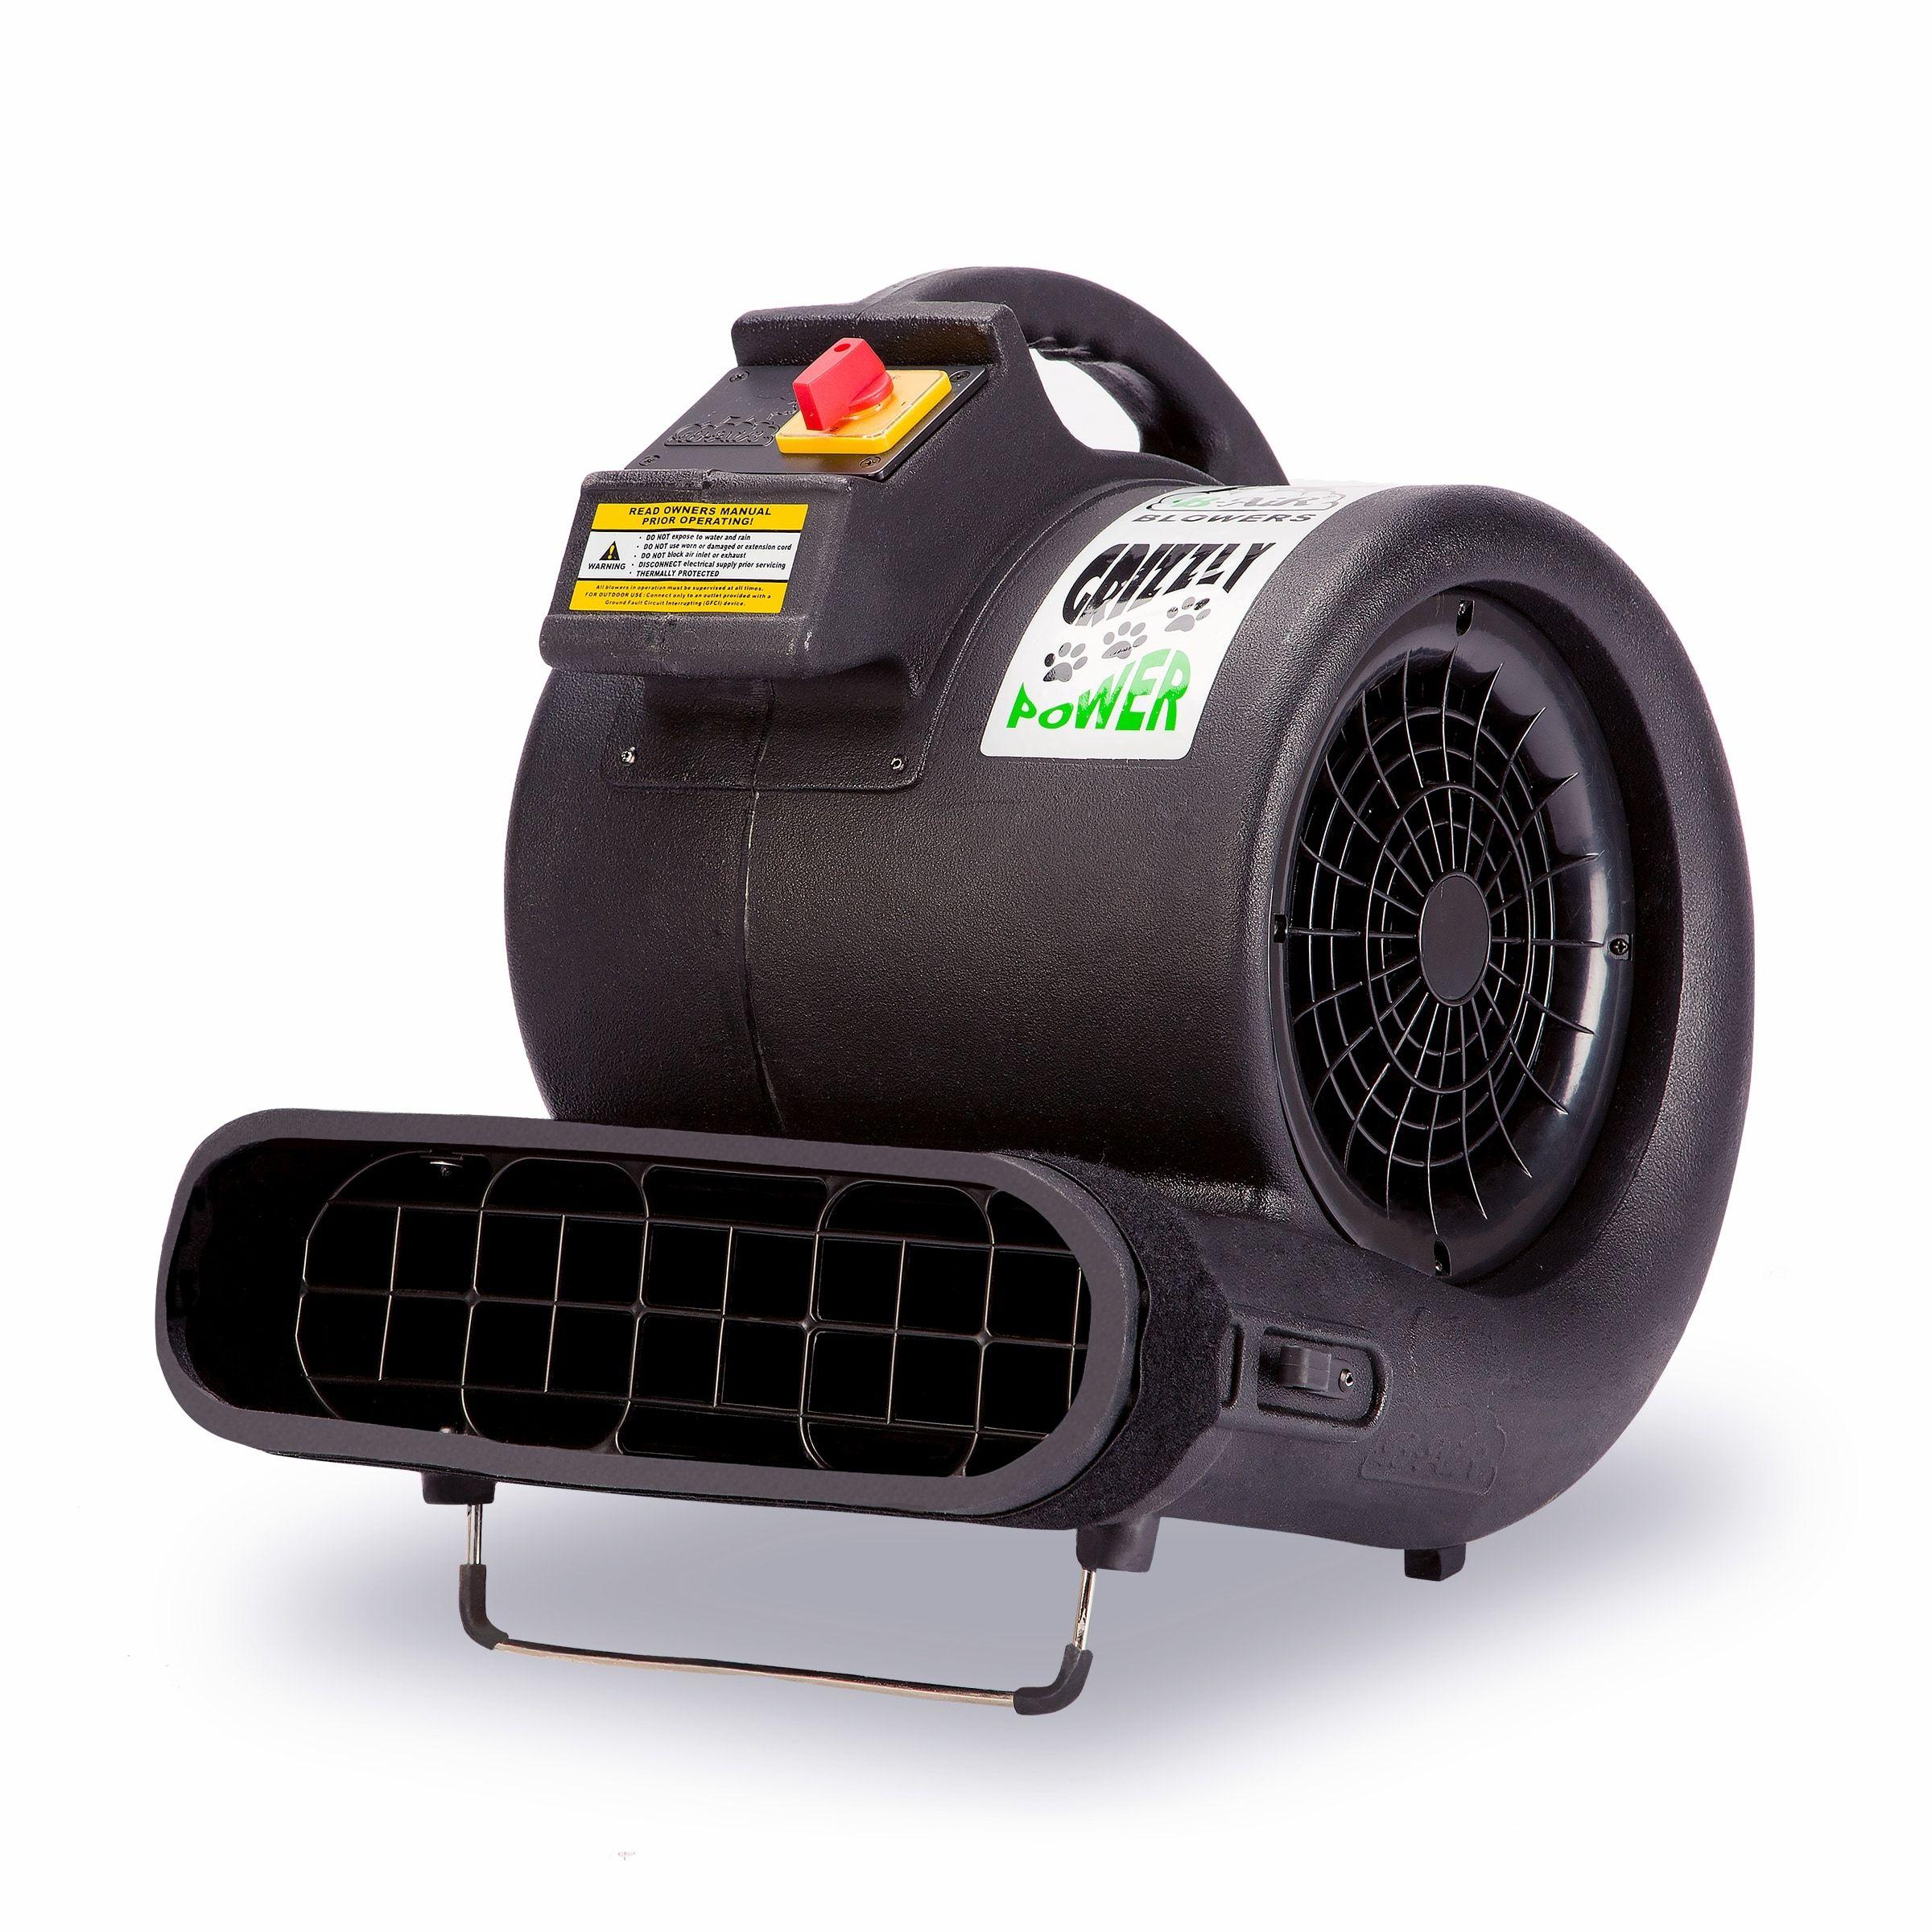 B Air Grizzly Gp 1 1 Hp 3550 Cfm Air Mover Carpet Dryer Floor Fan For Water Damage Restoration Black Outdoor Power Equipment Flooring Restoration